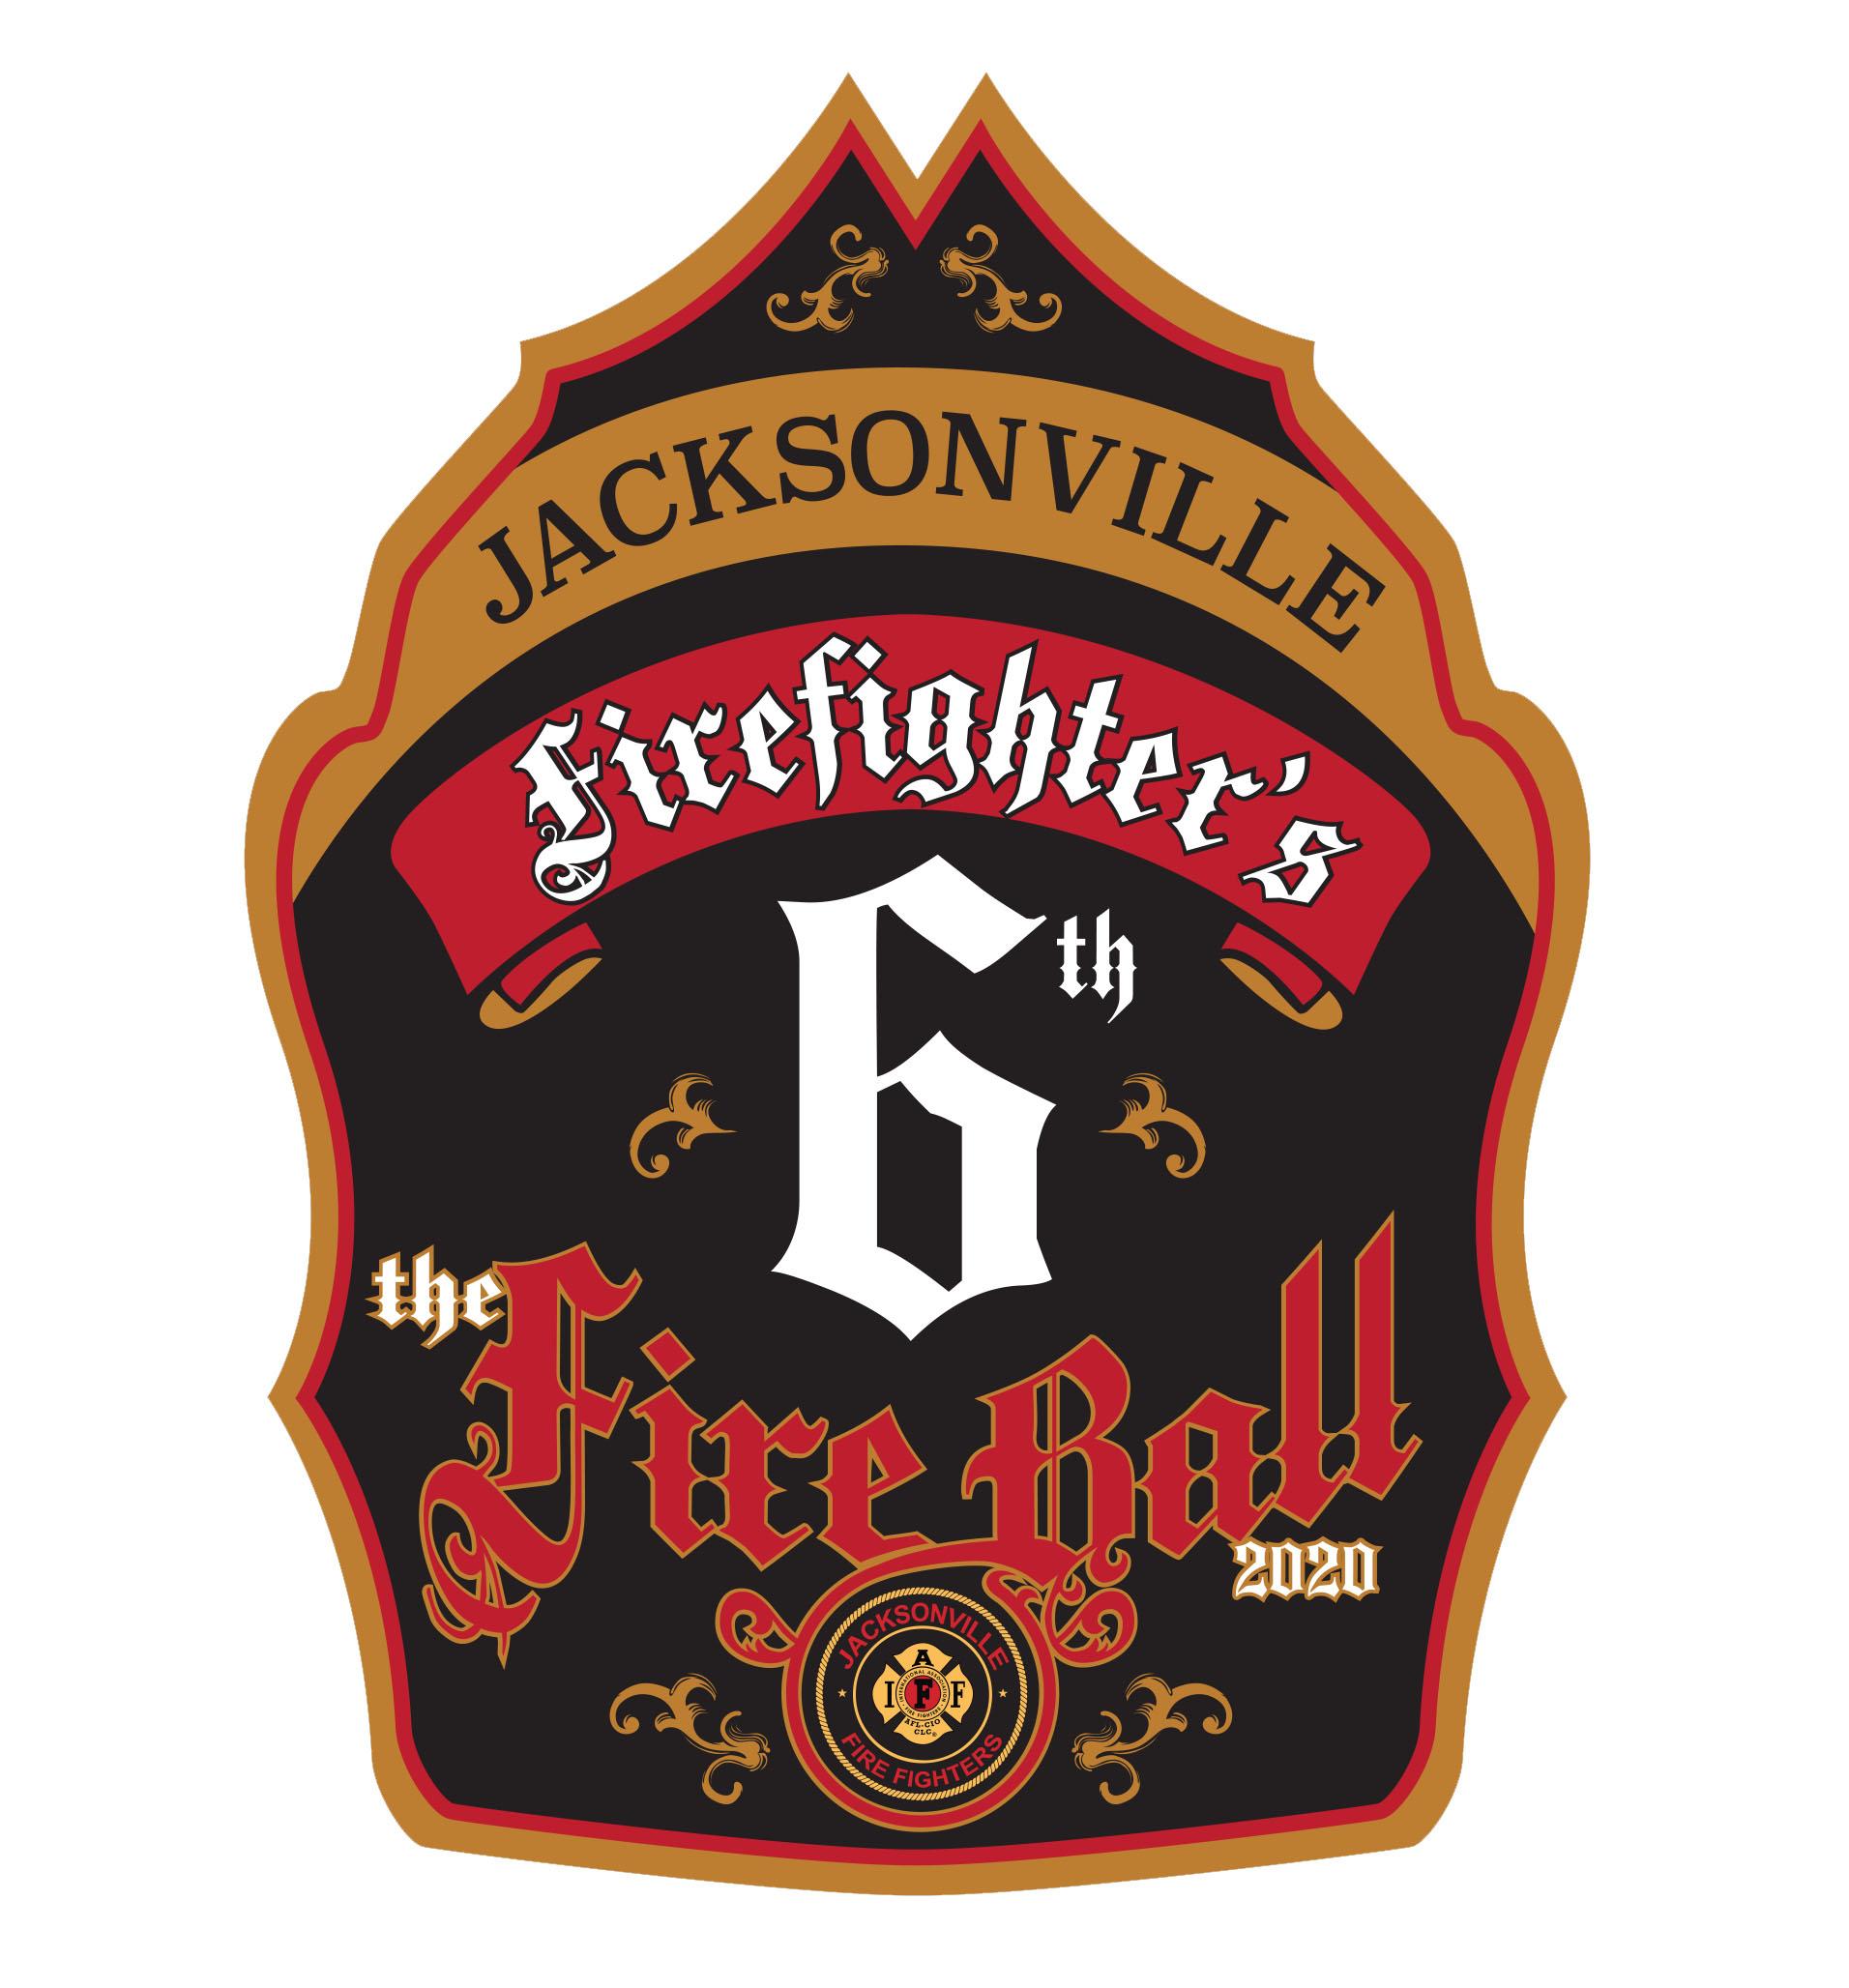 Photo of Jacksonville Firefighters Fireball 2020